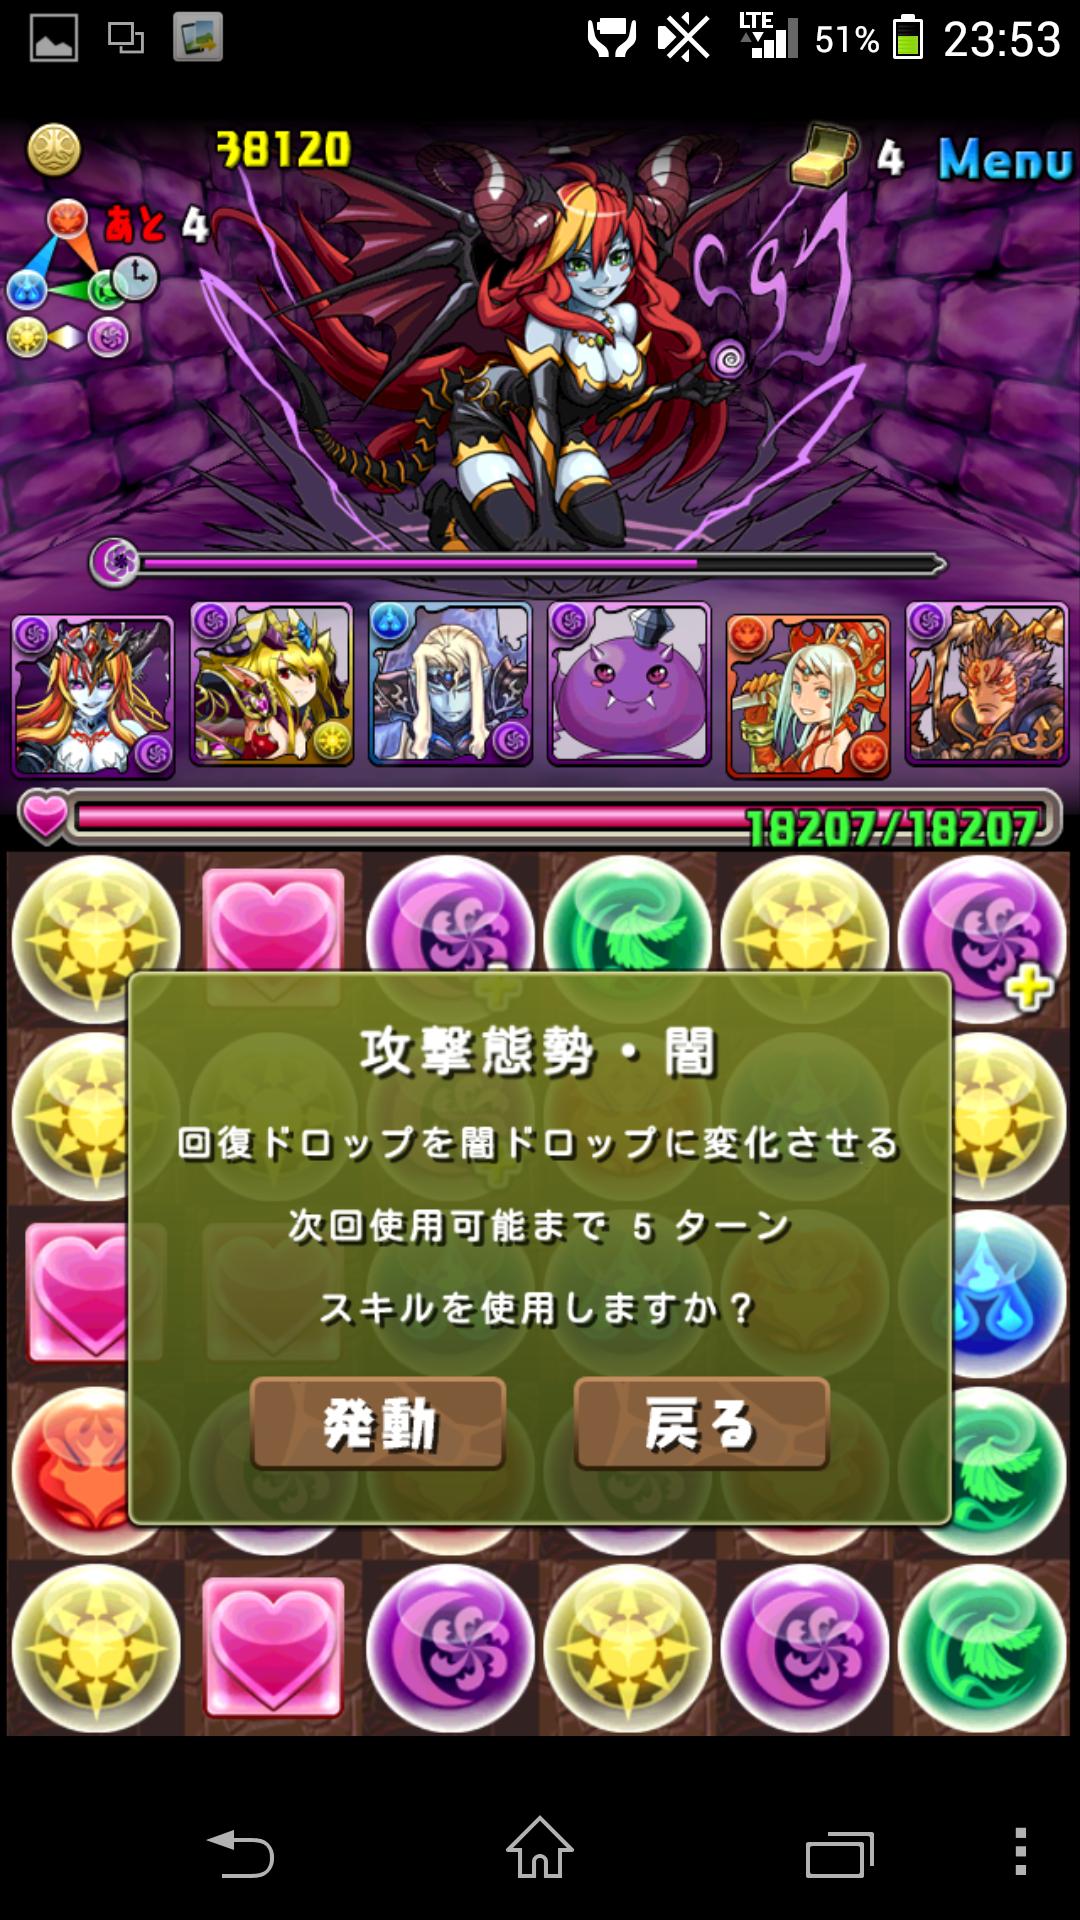 Screenshot_2014-04-17-23-53-57.png